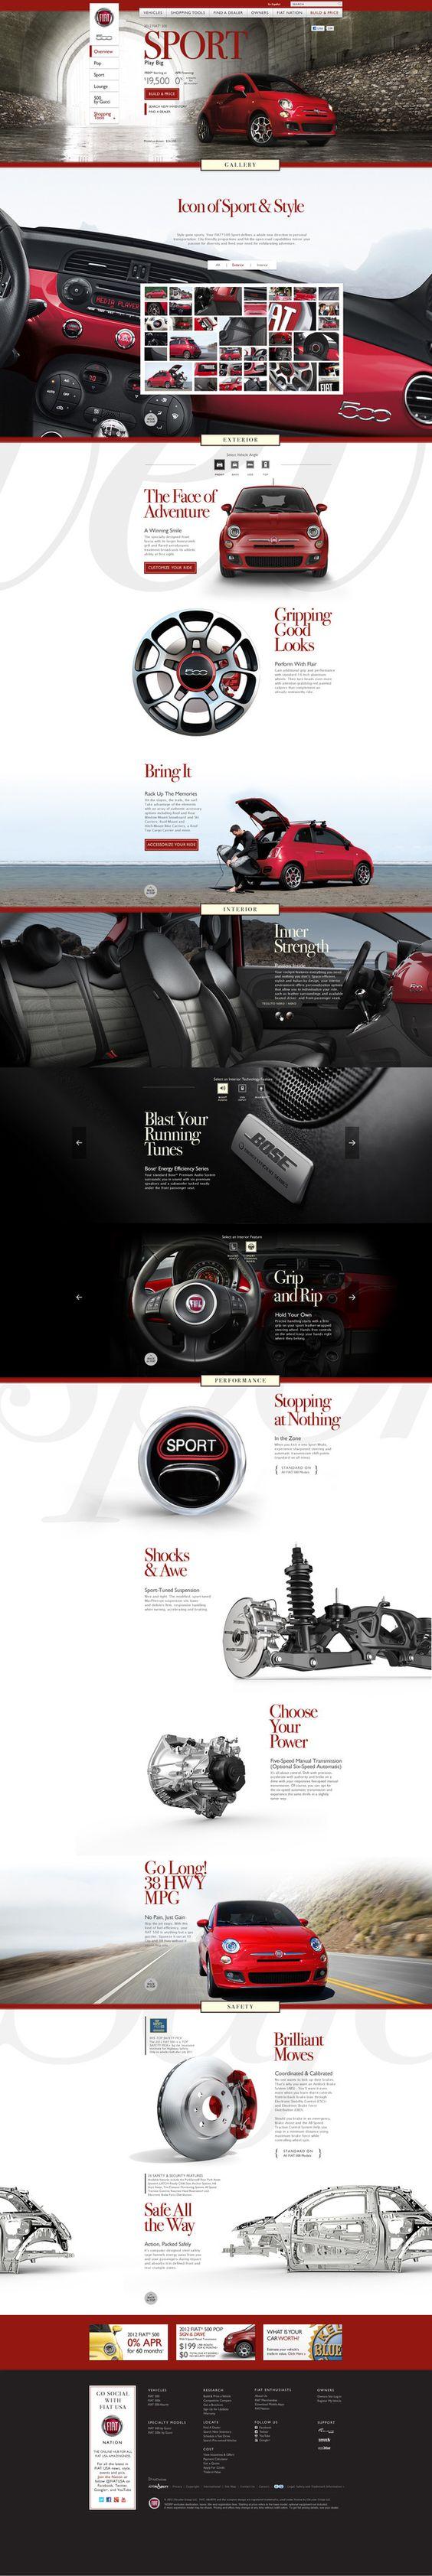 Fiat USA site by Otto Othman, via Behance